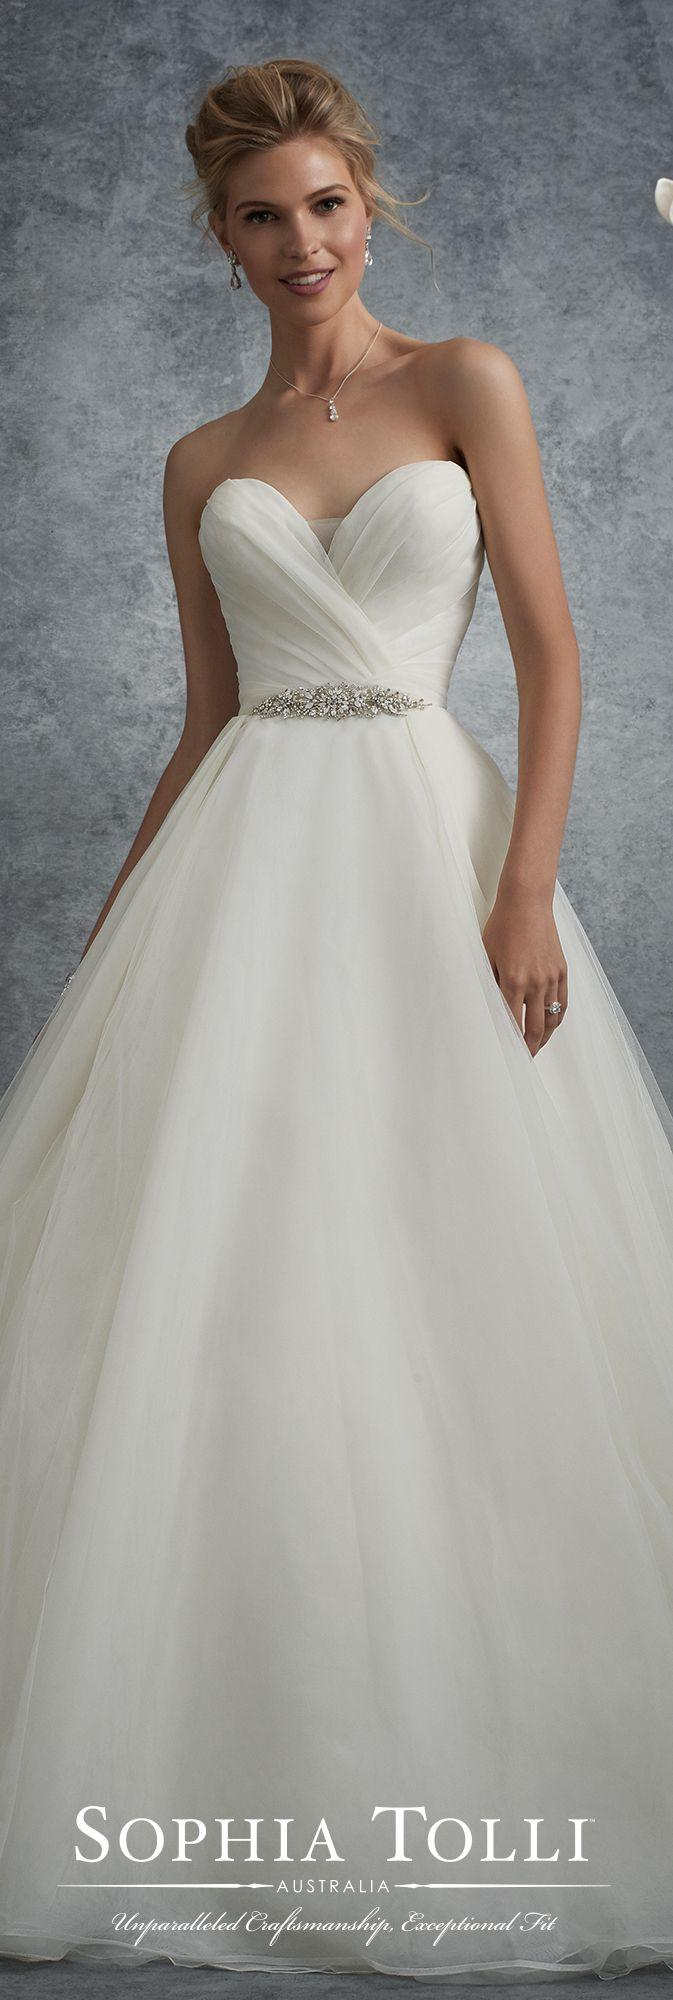 Wedding - Strapless Sweetheart Tulle Full A-line Wedding Dress - Sophia Tolli Y21761B